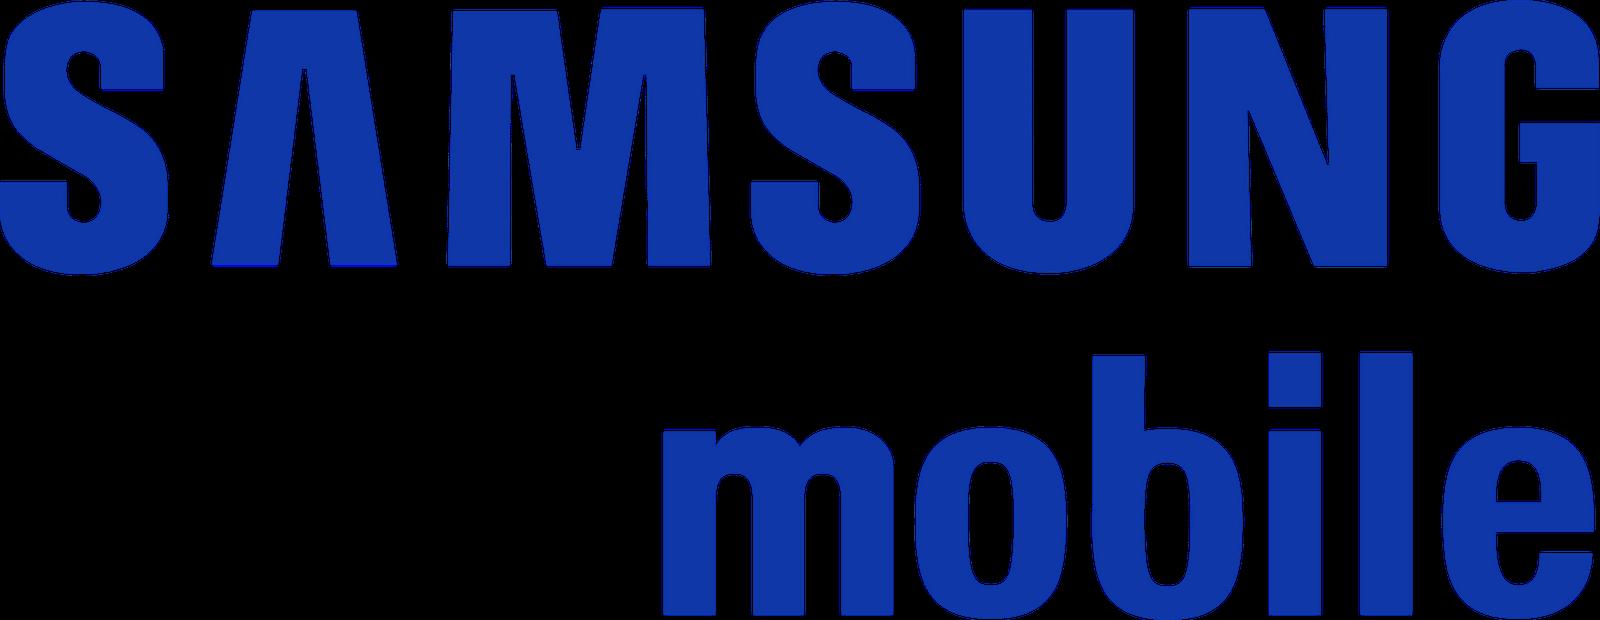 Slot Nigeria Phone Price List 2017 Blackberry Samsung